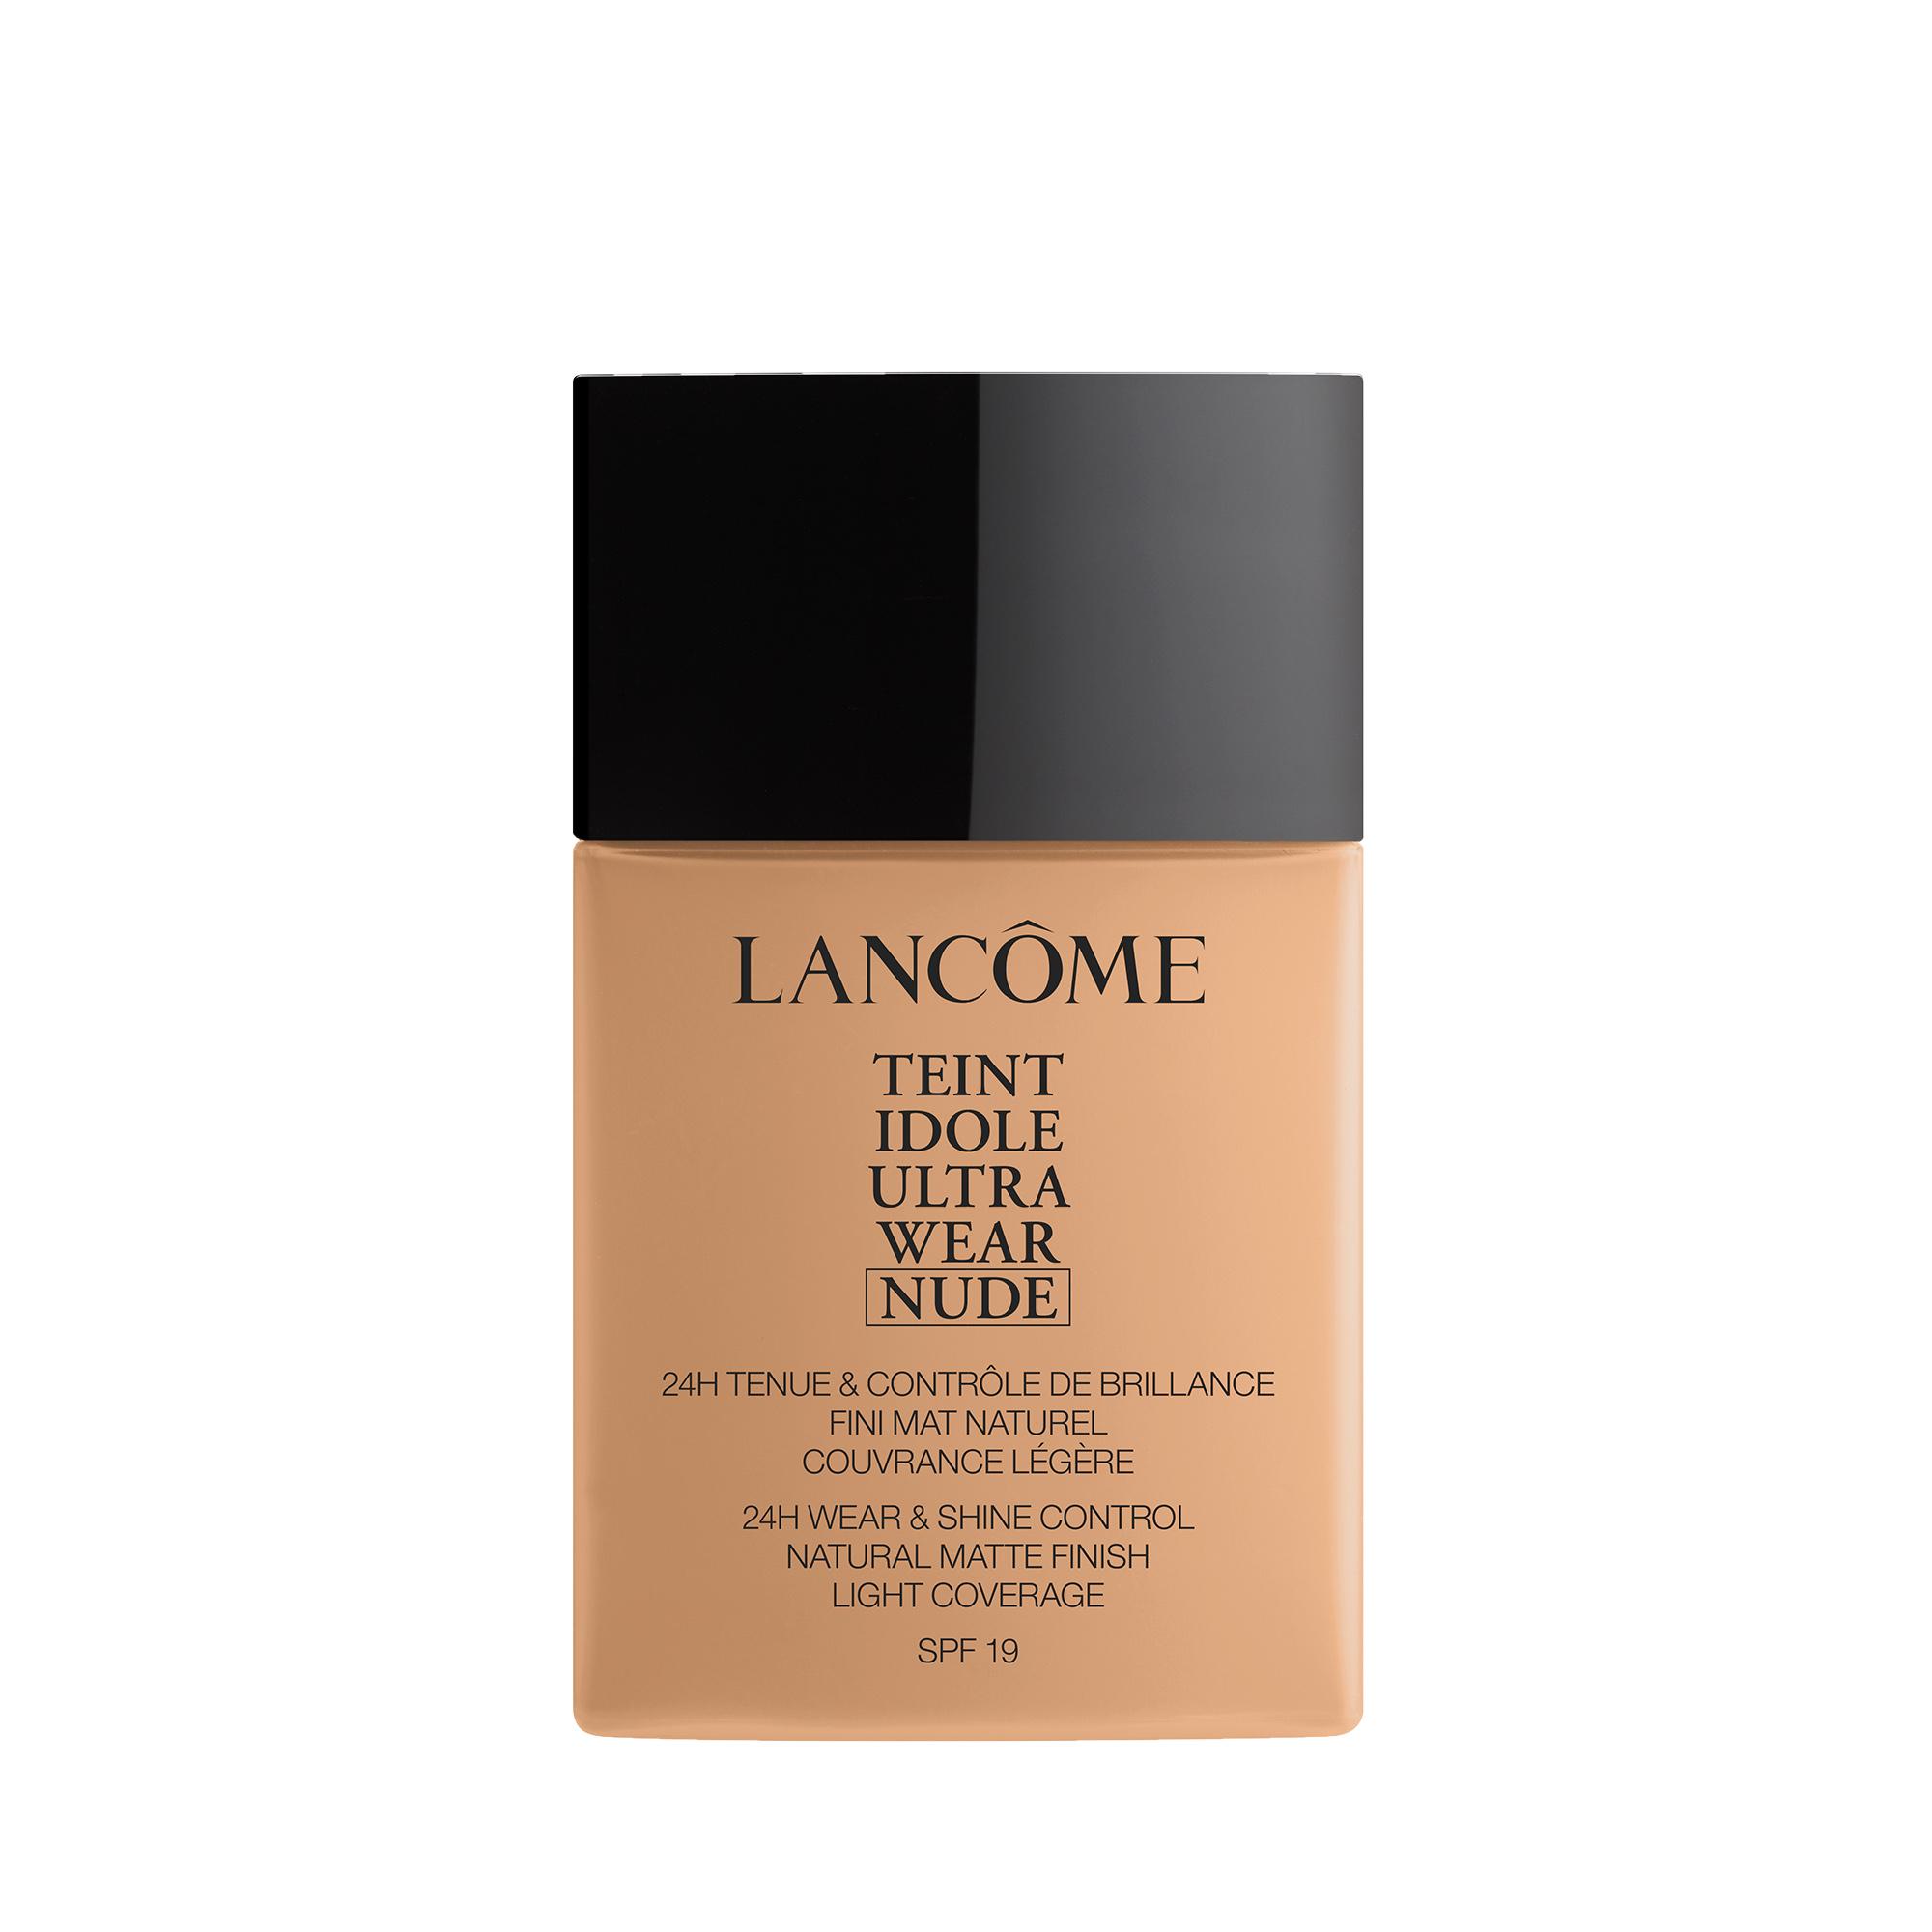 lancome foundation kicks